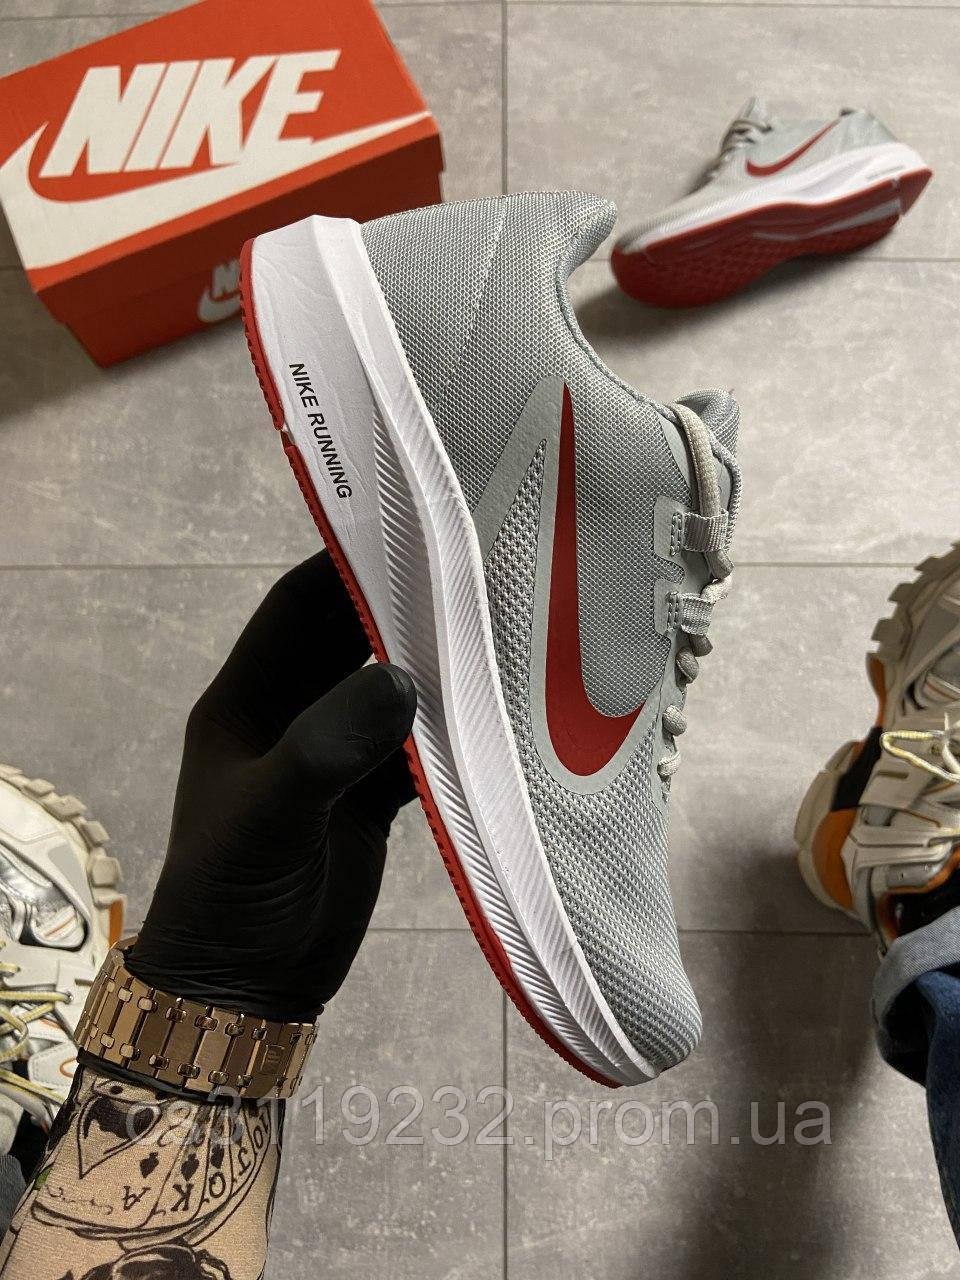 Мужские кроссовки Nike Runner 2 Gray/Red (серые)